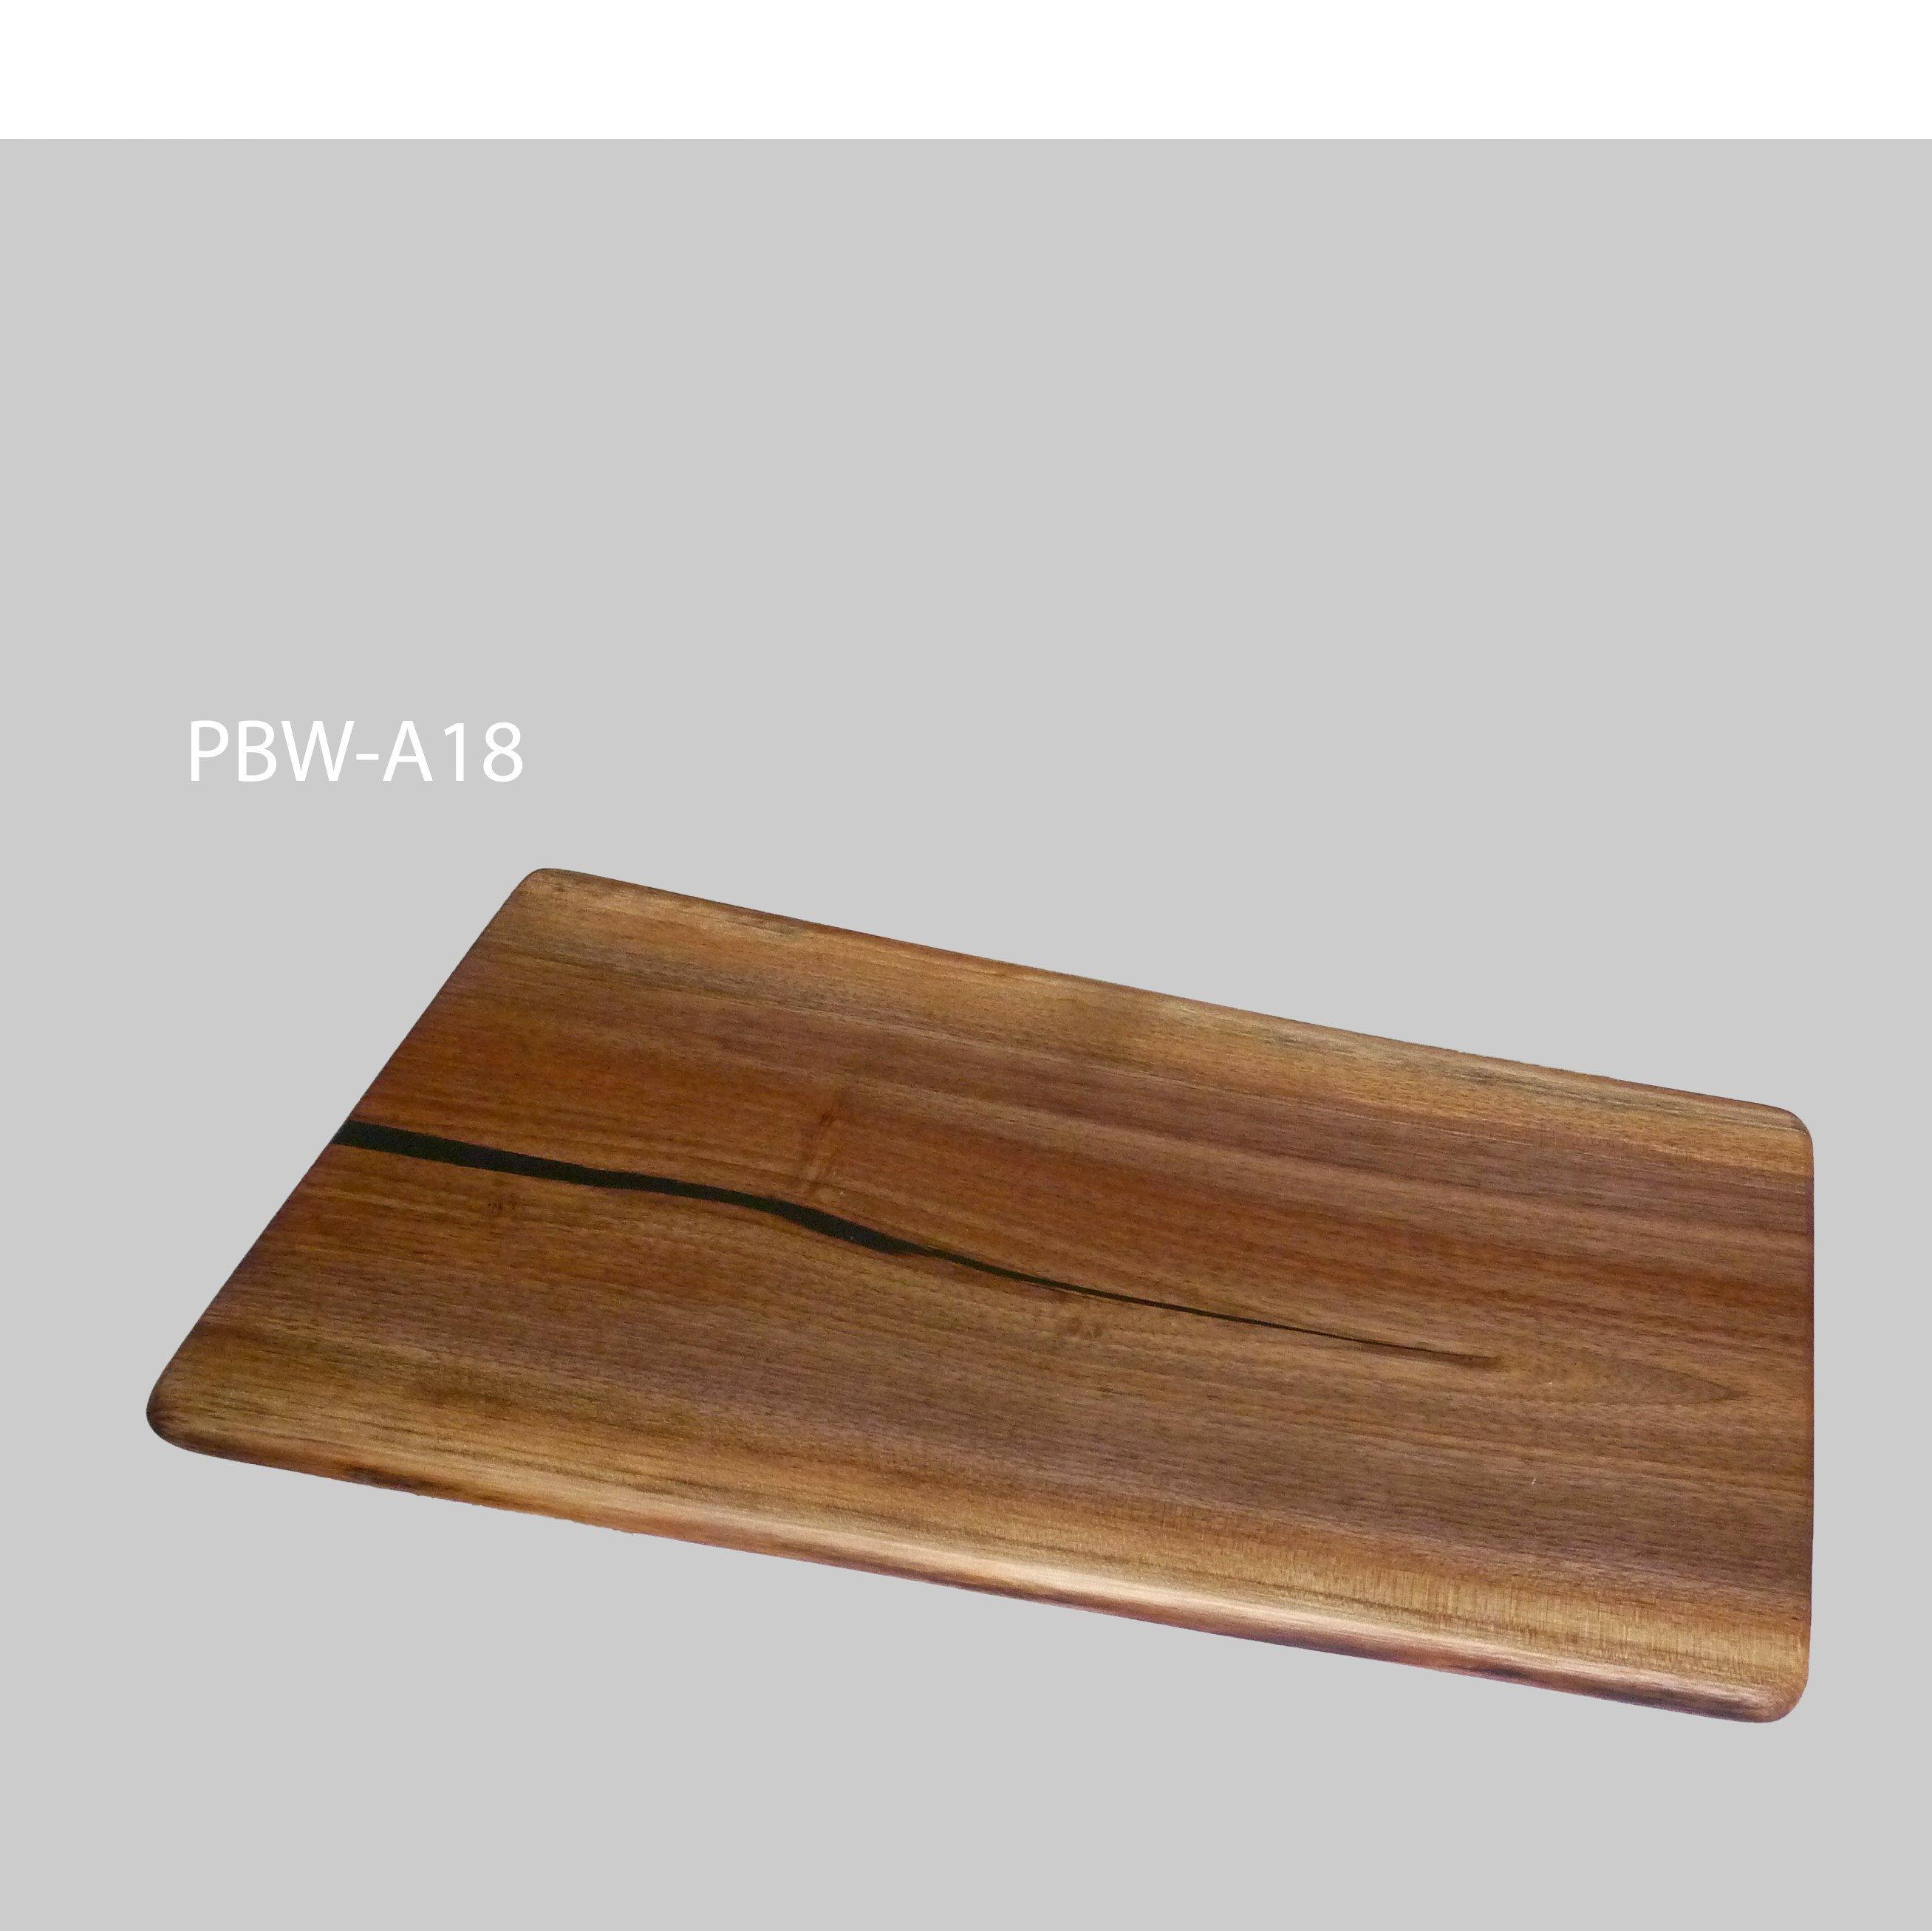 PBW-A18